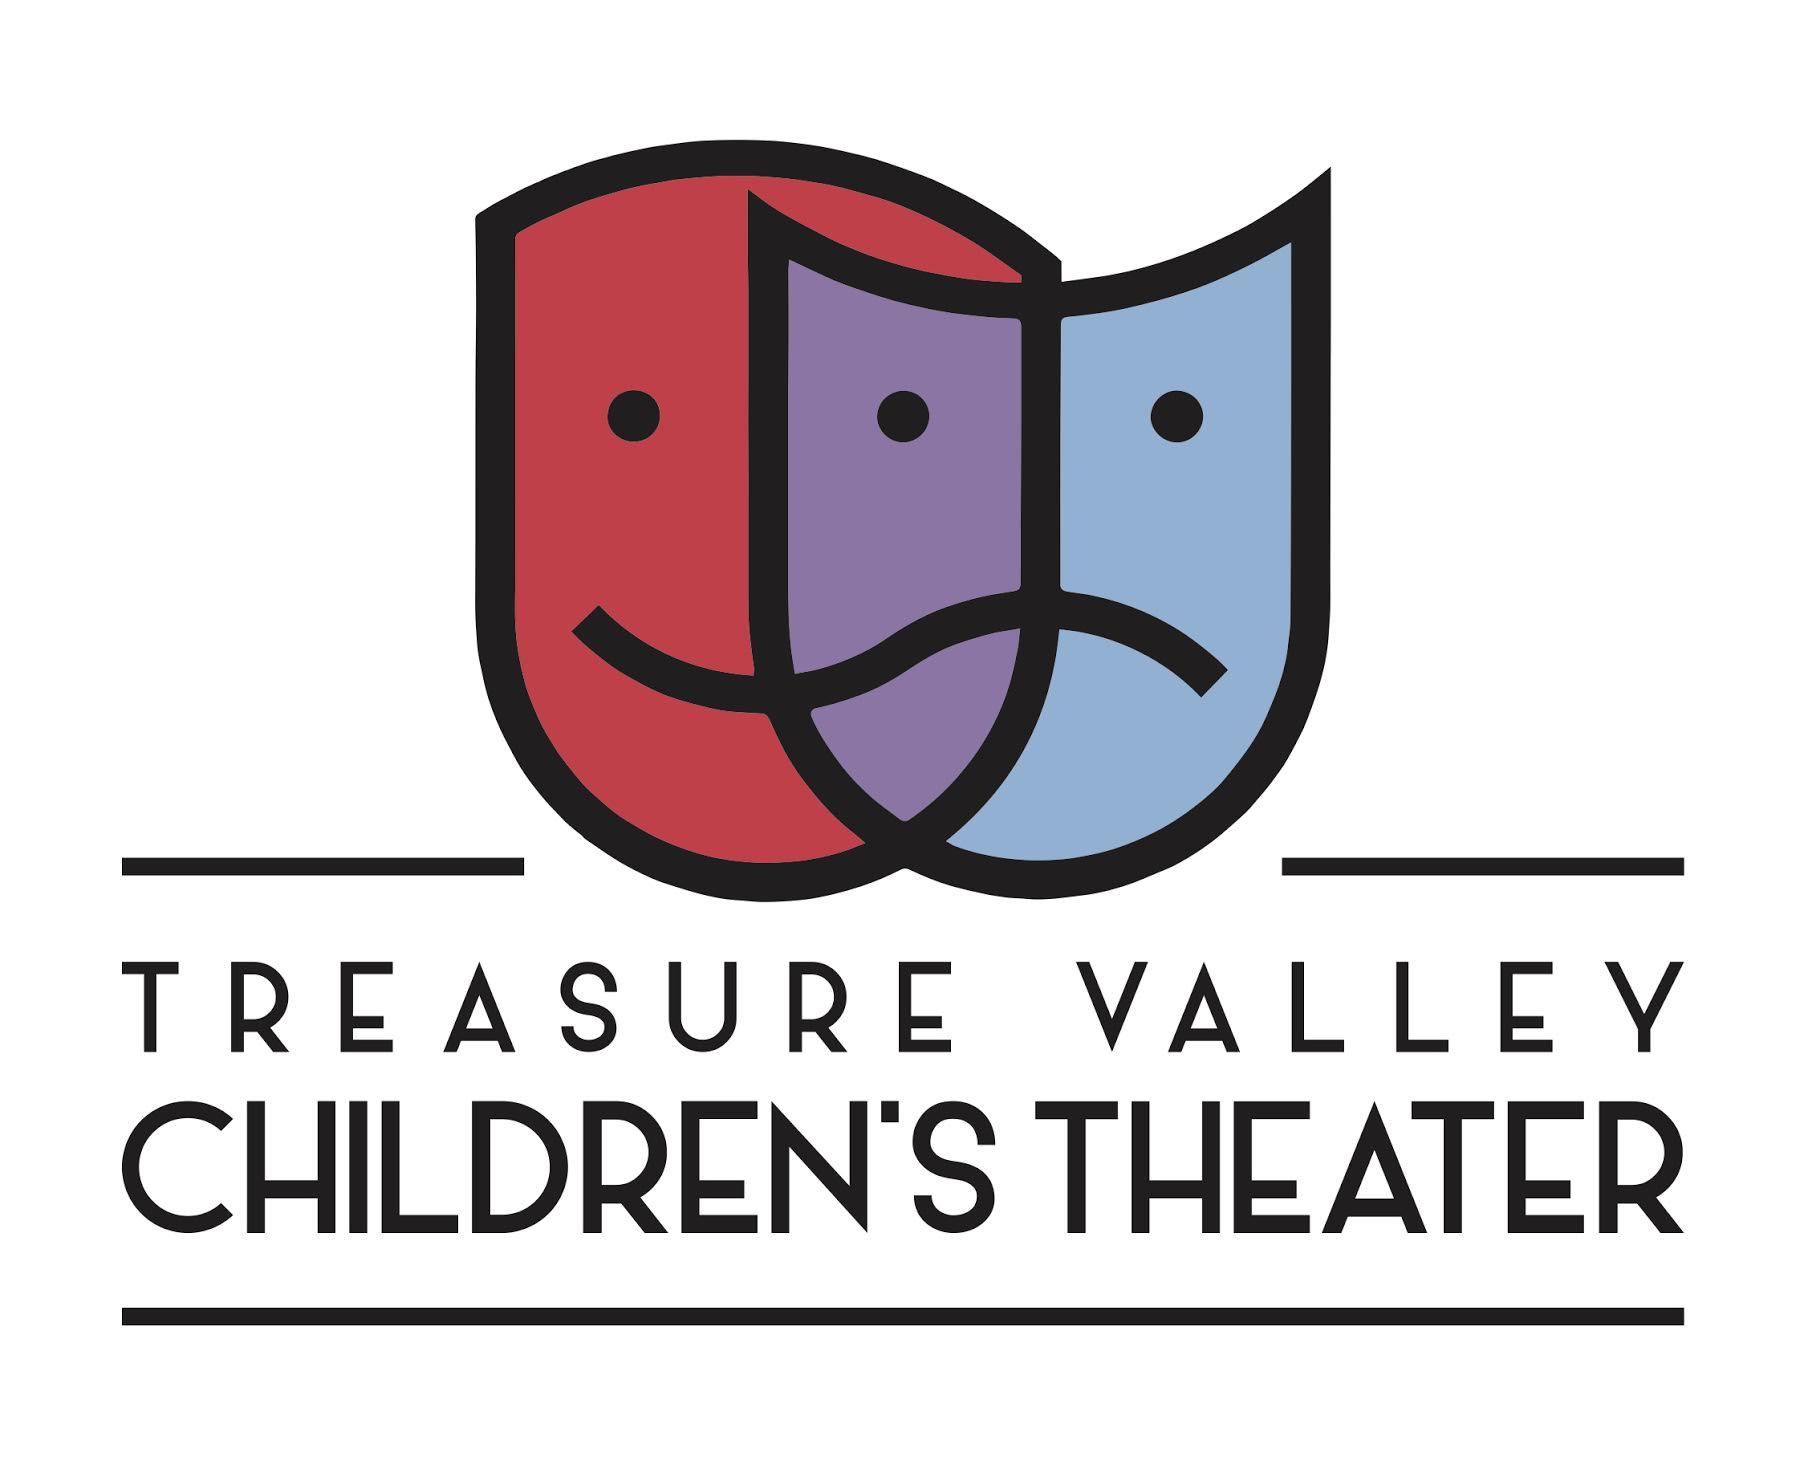 Treasure Valley Children's Theater